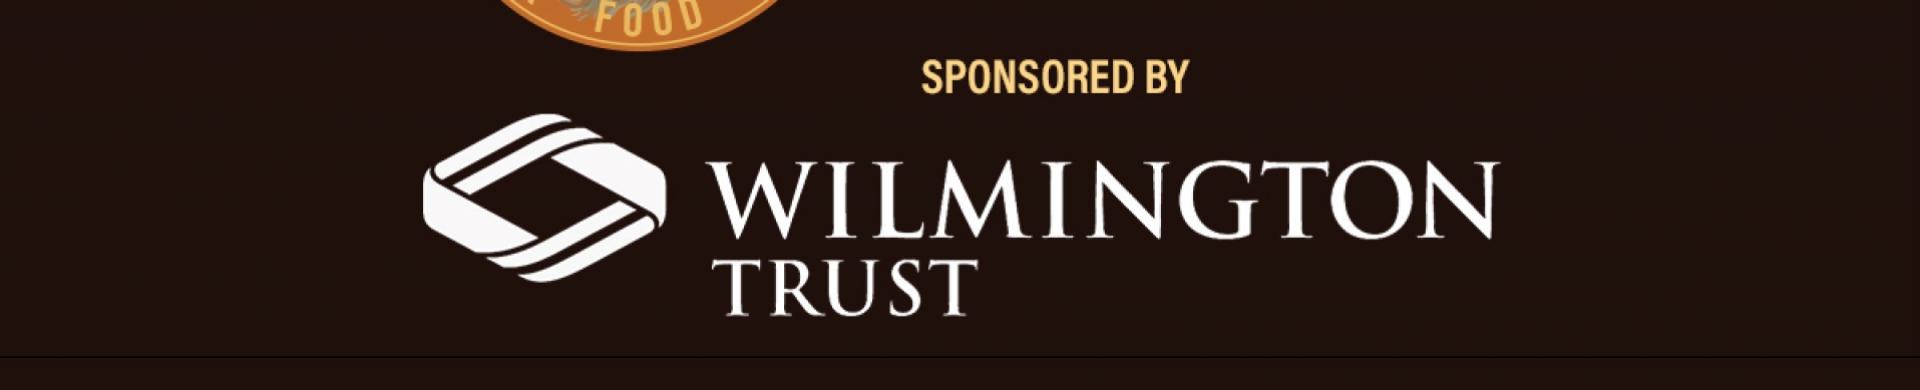 2018 Brewfest presenting Sponsor